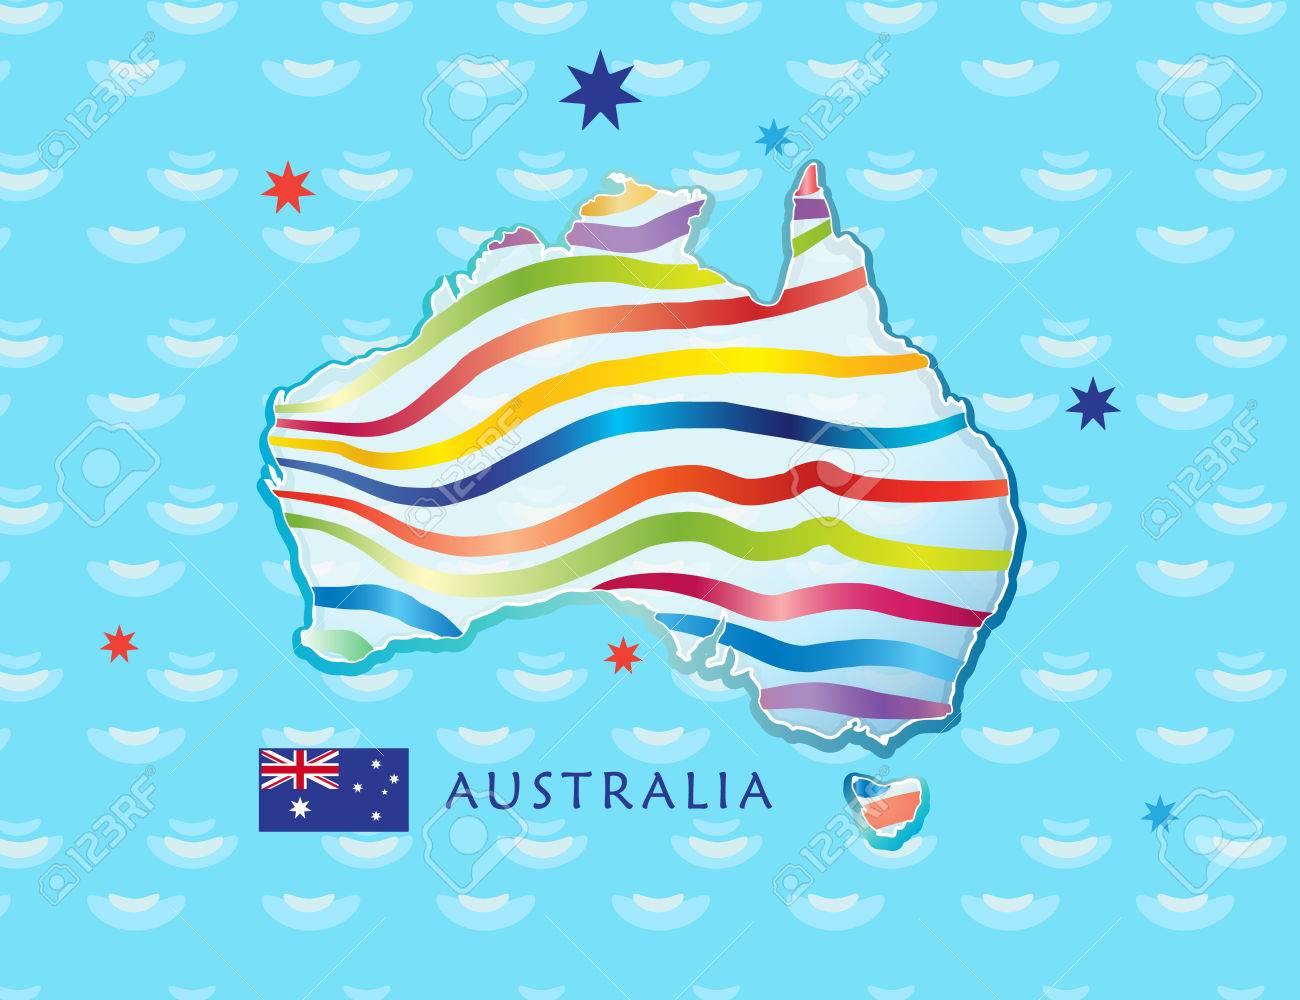 Australia Map Poster.Map Of Australia For Celebration Australia Day 26th January